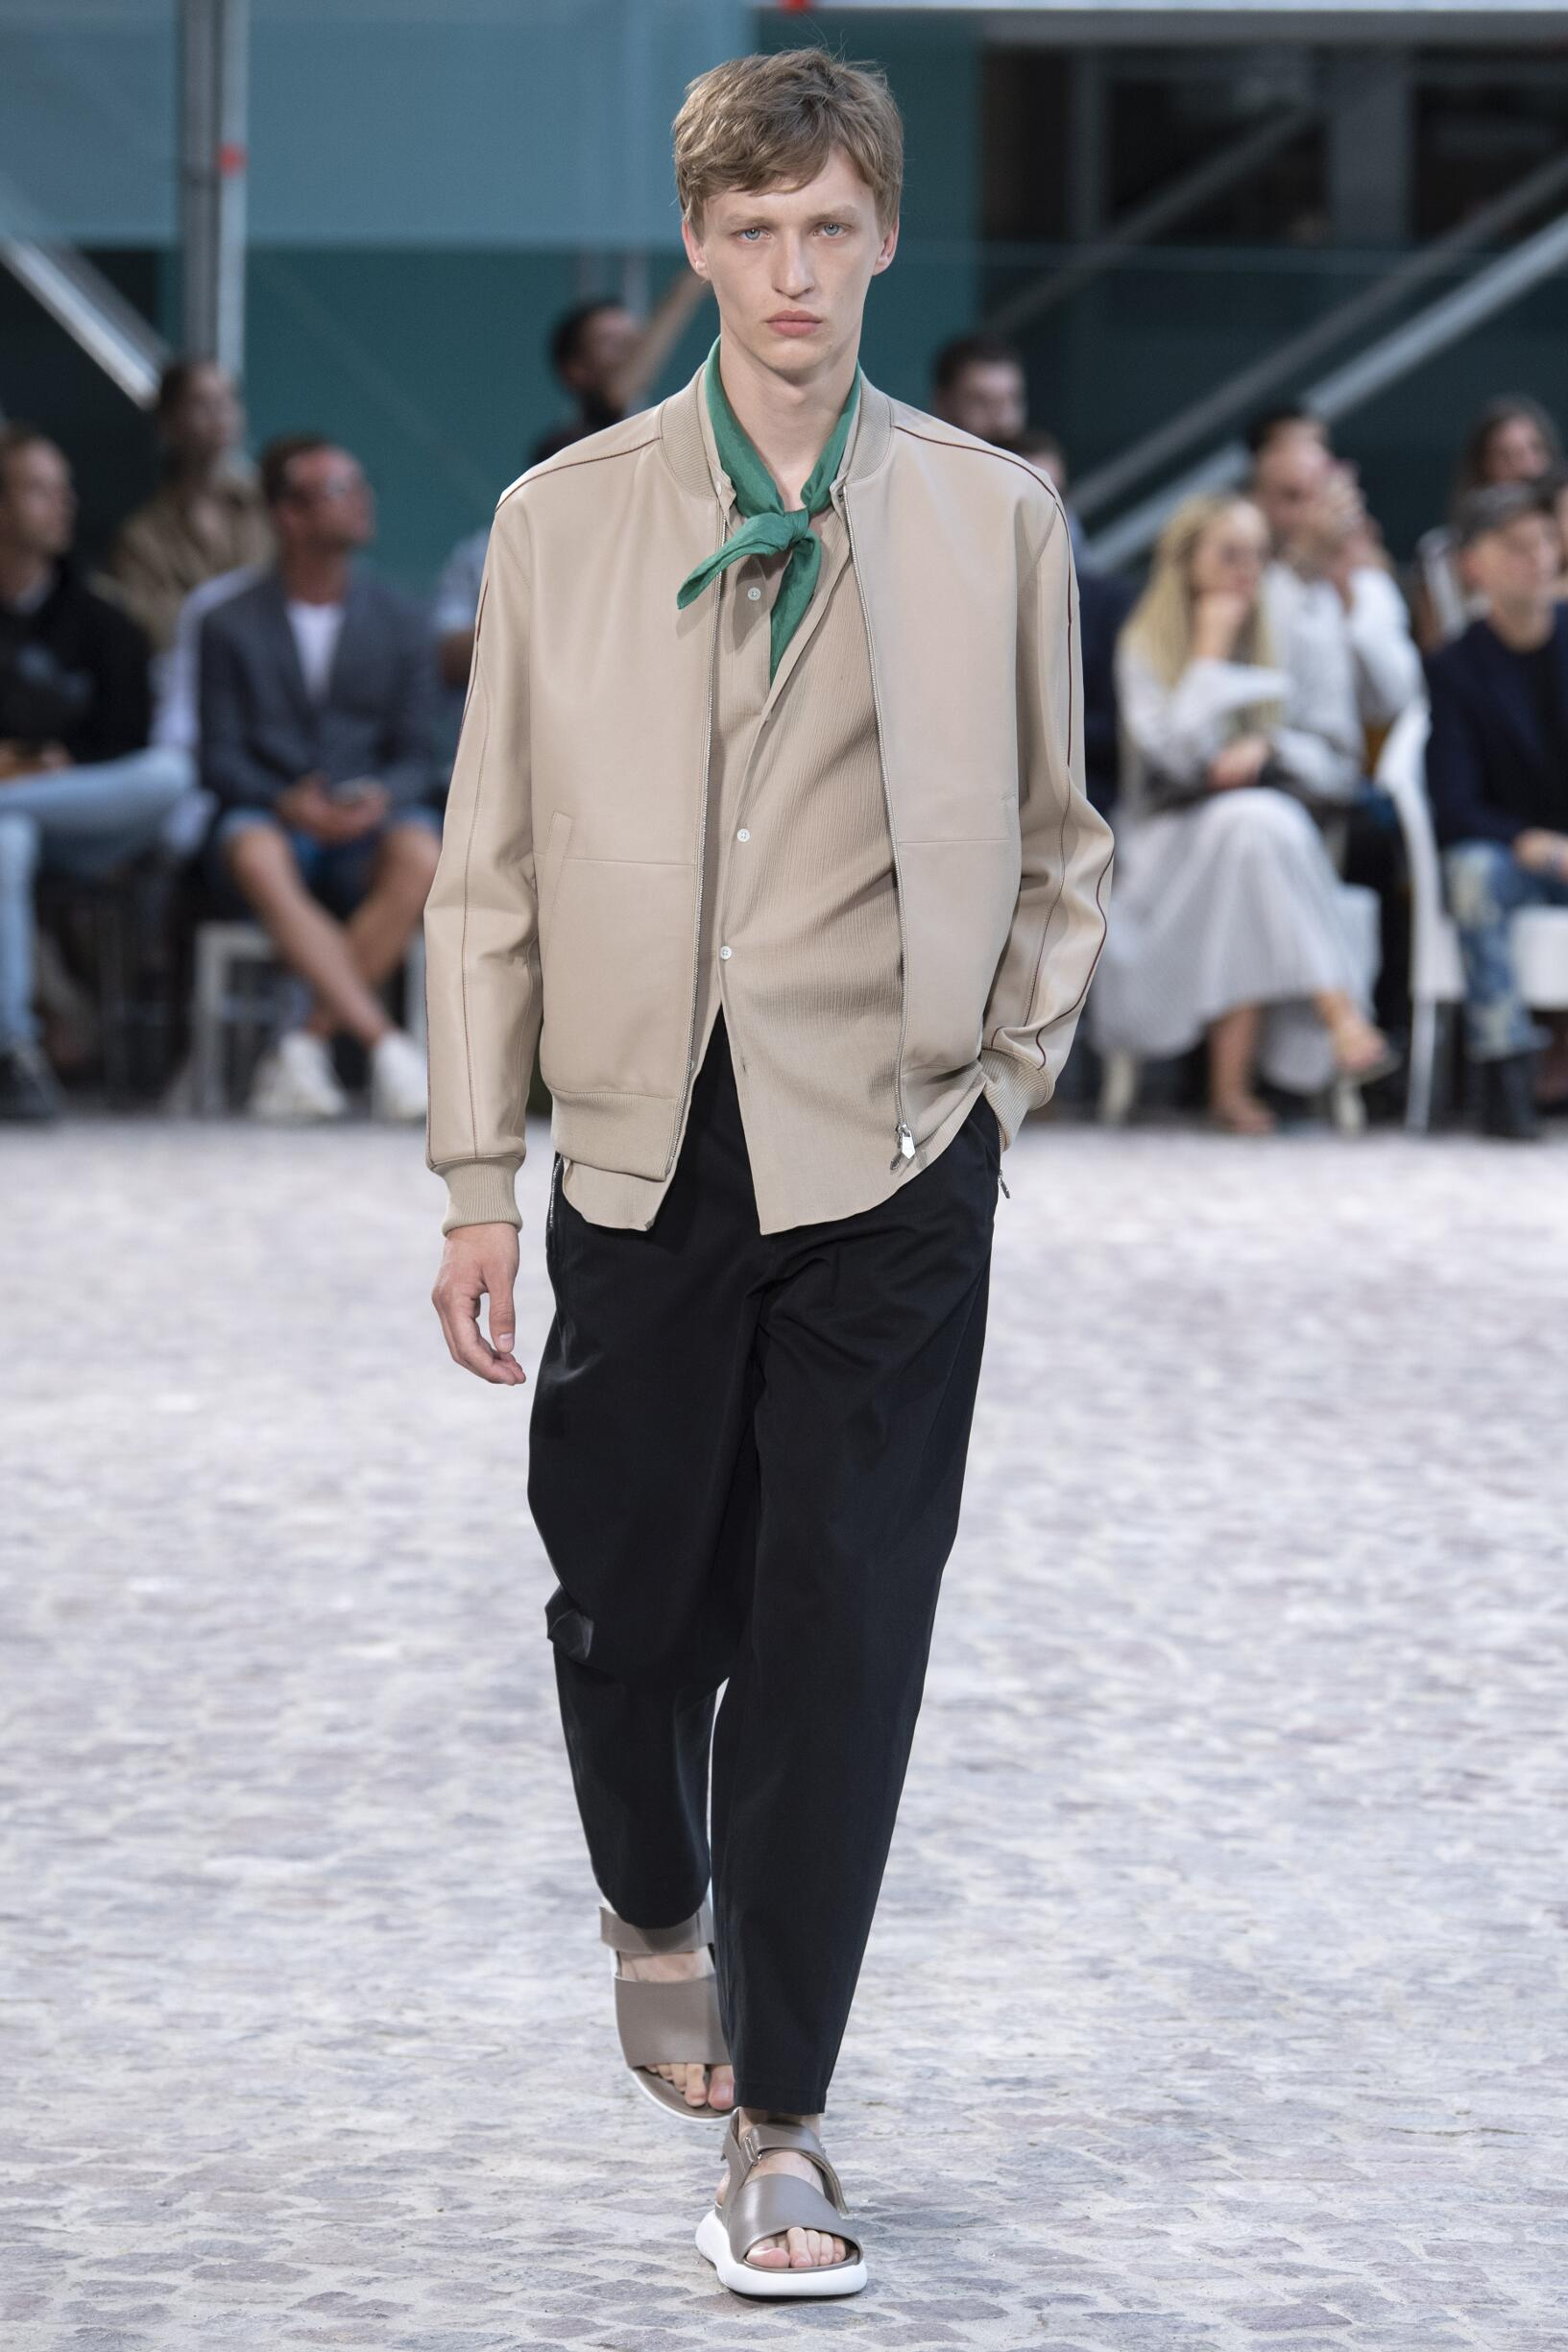 Runway Hermès Spring Summer 2020 Men's Collection Paris Fashion Week